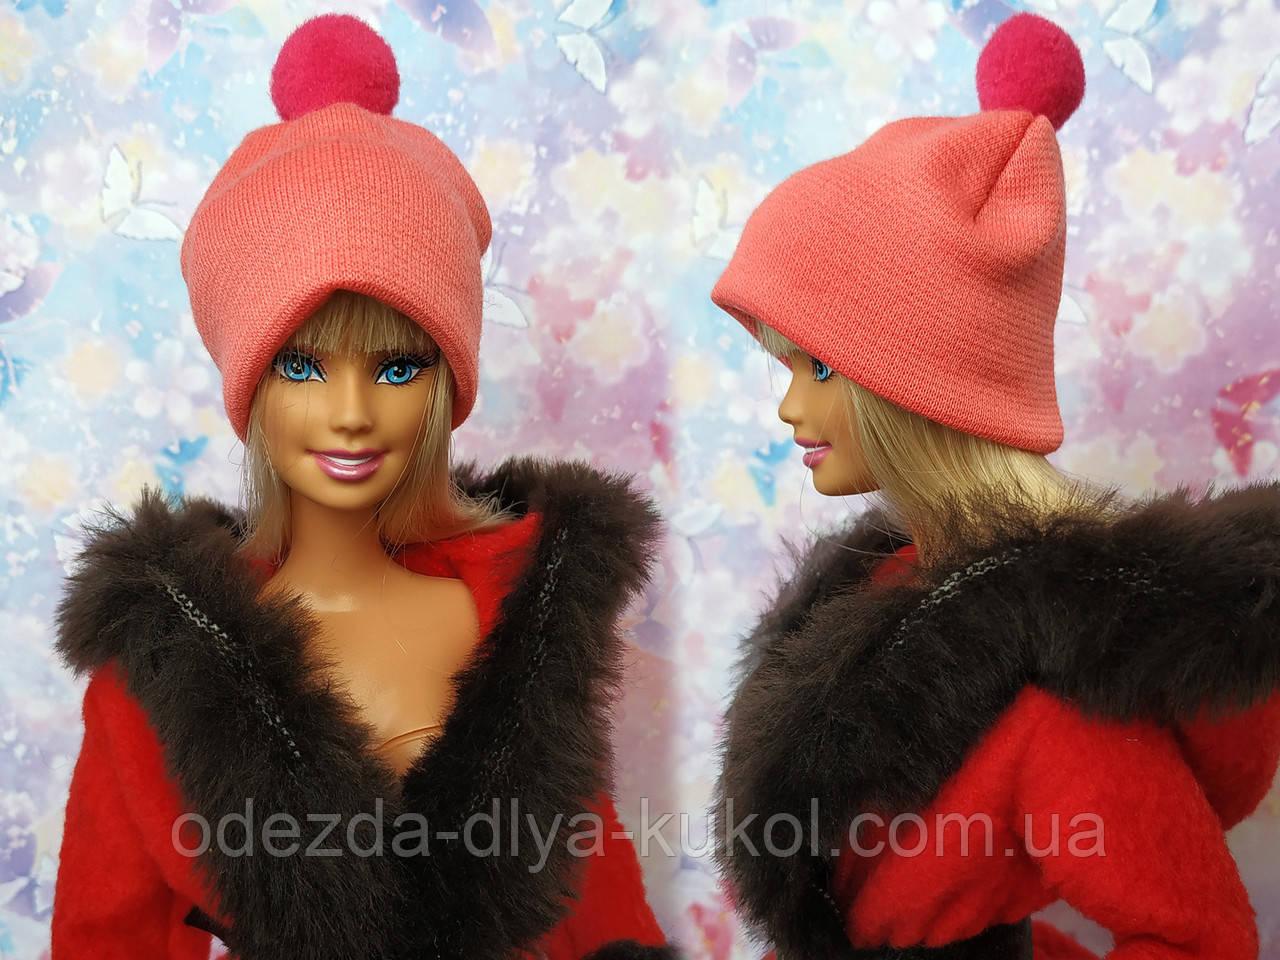 Одежда для кукол Барби - шапочка